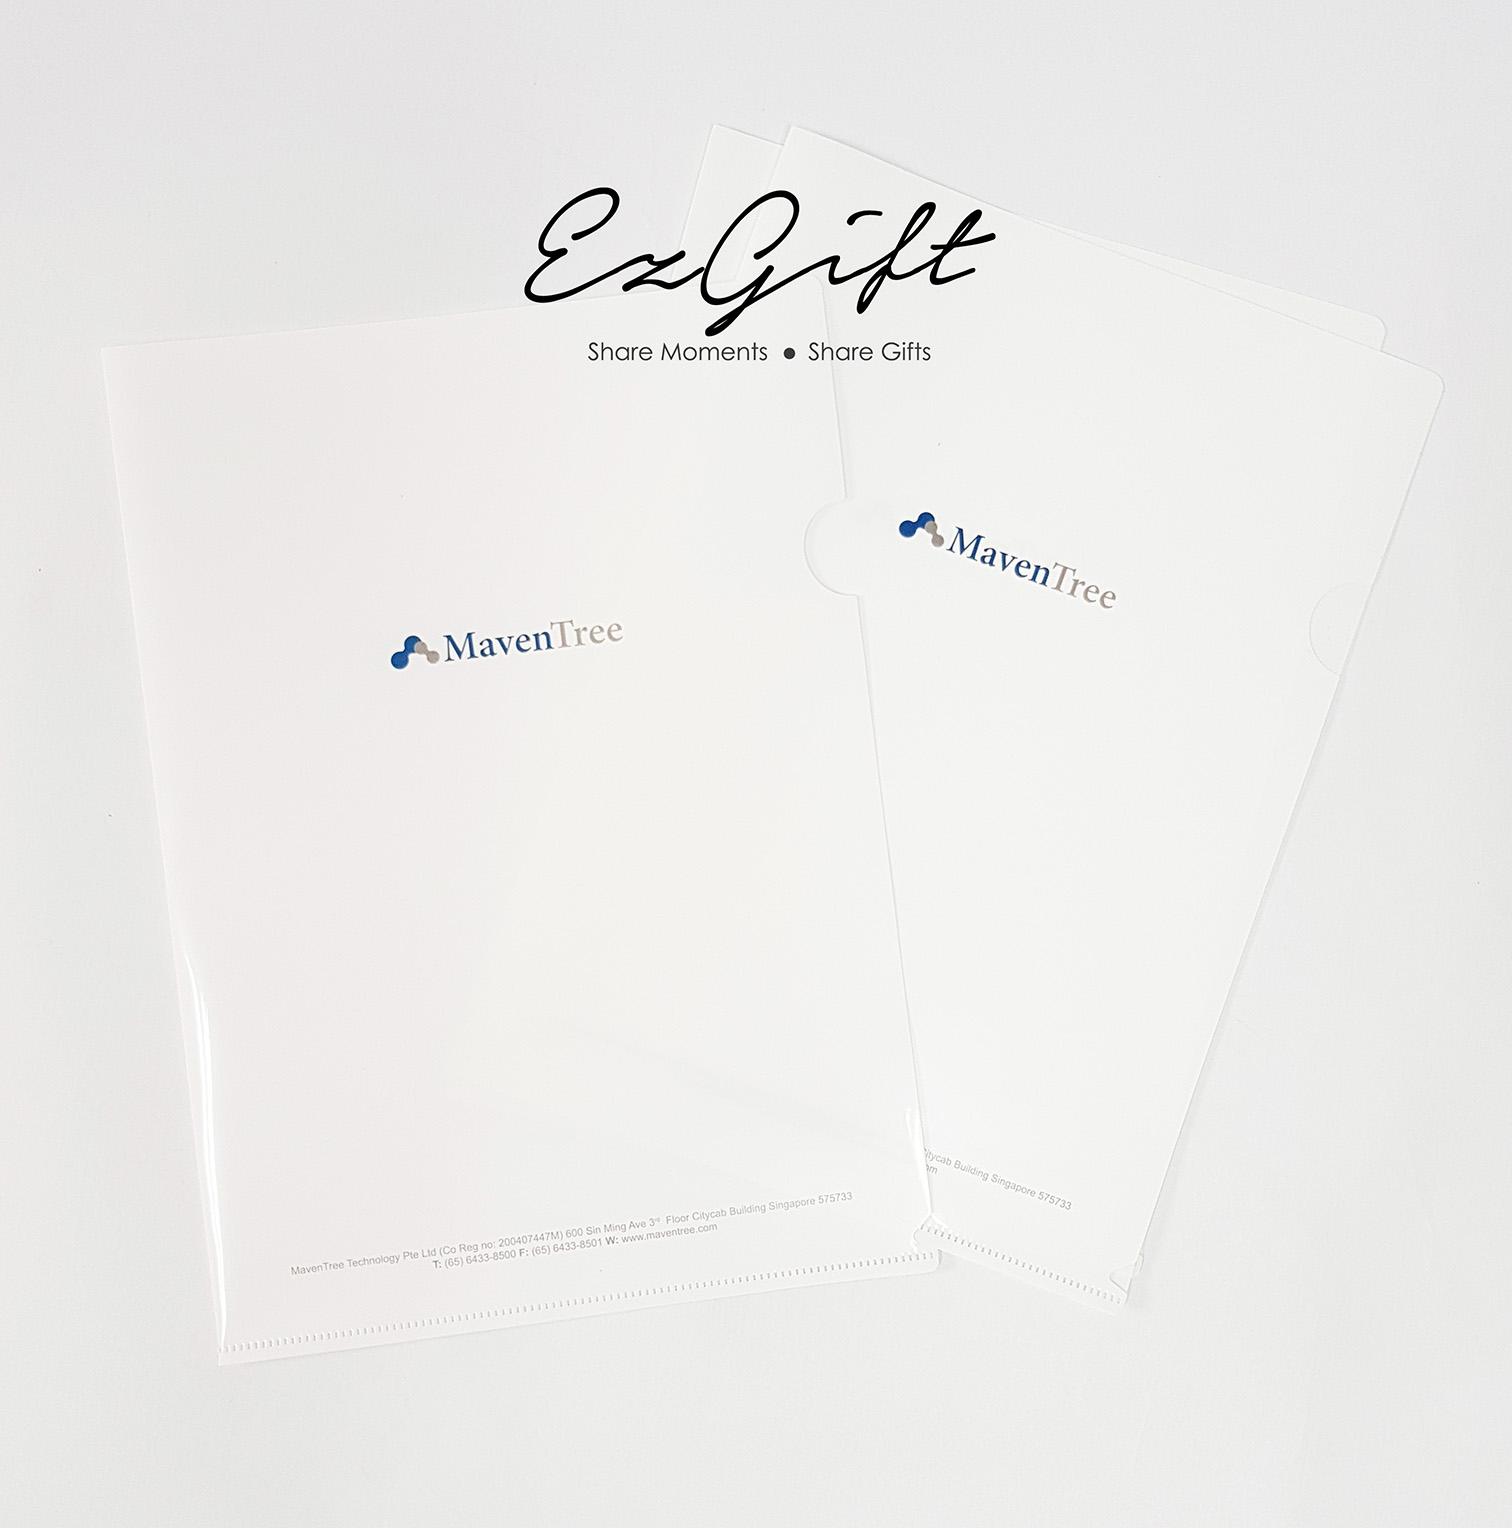 Ezgifi_Maventree Project